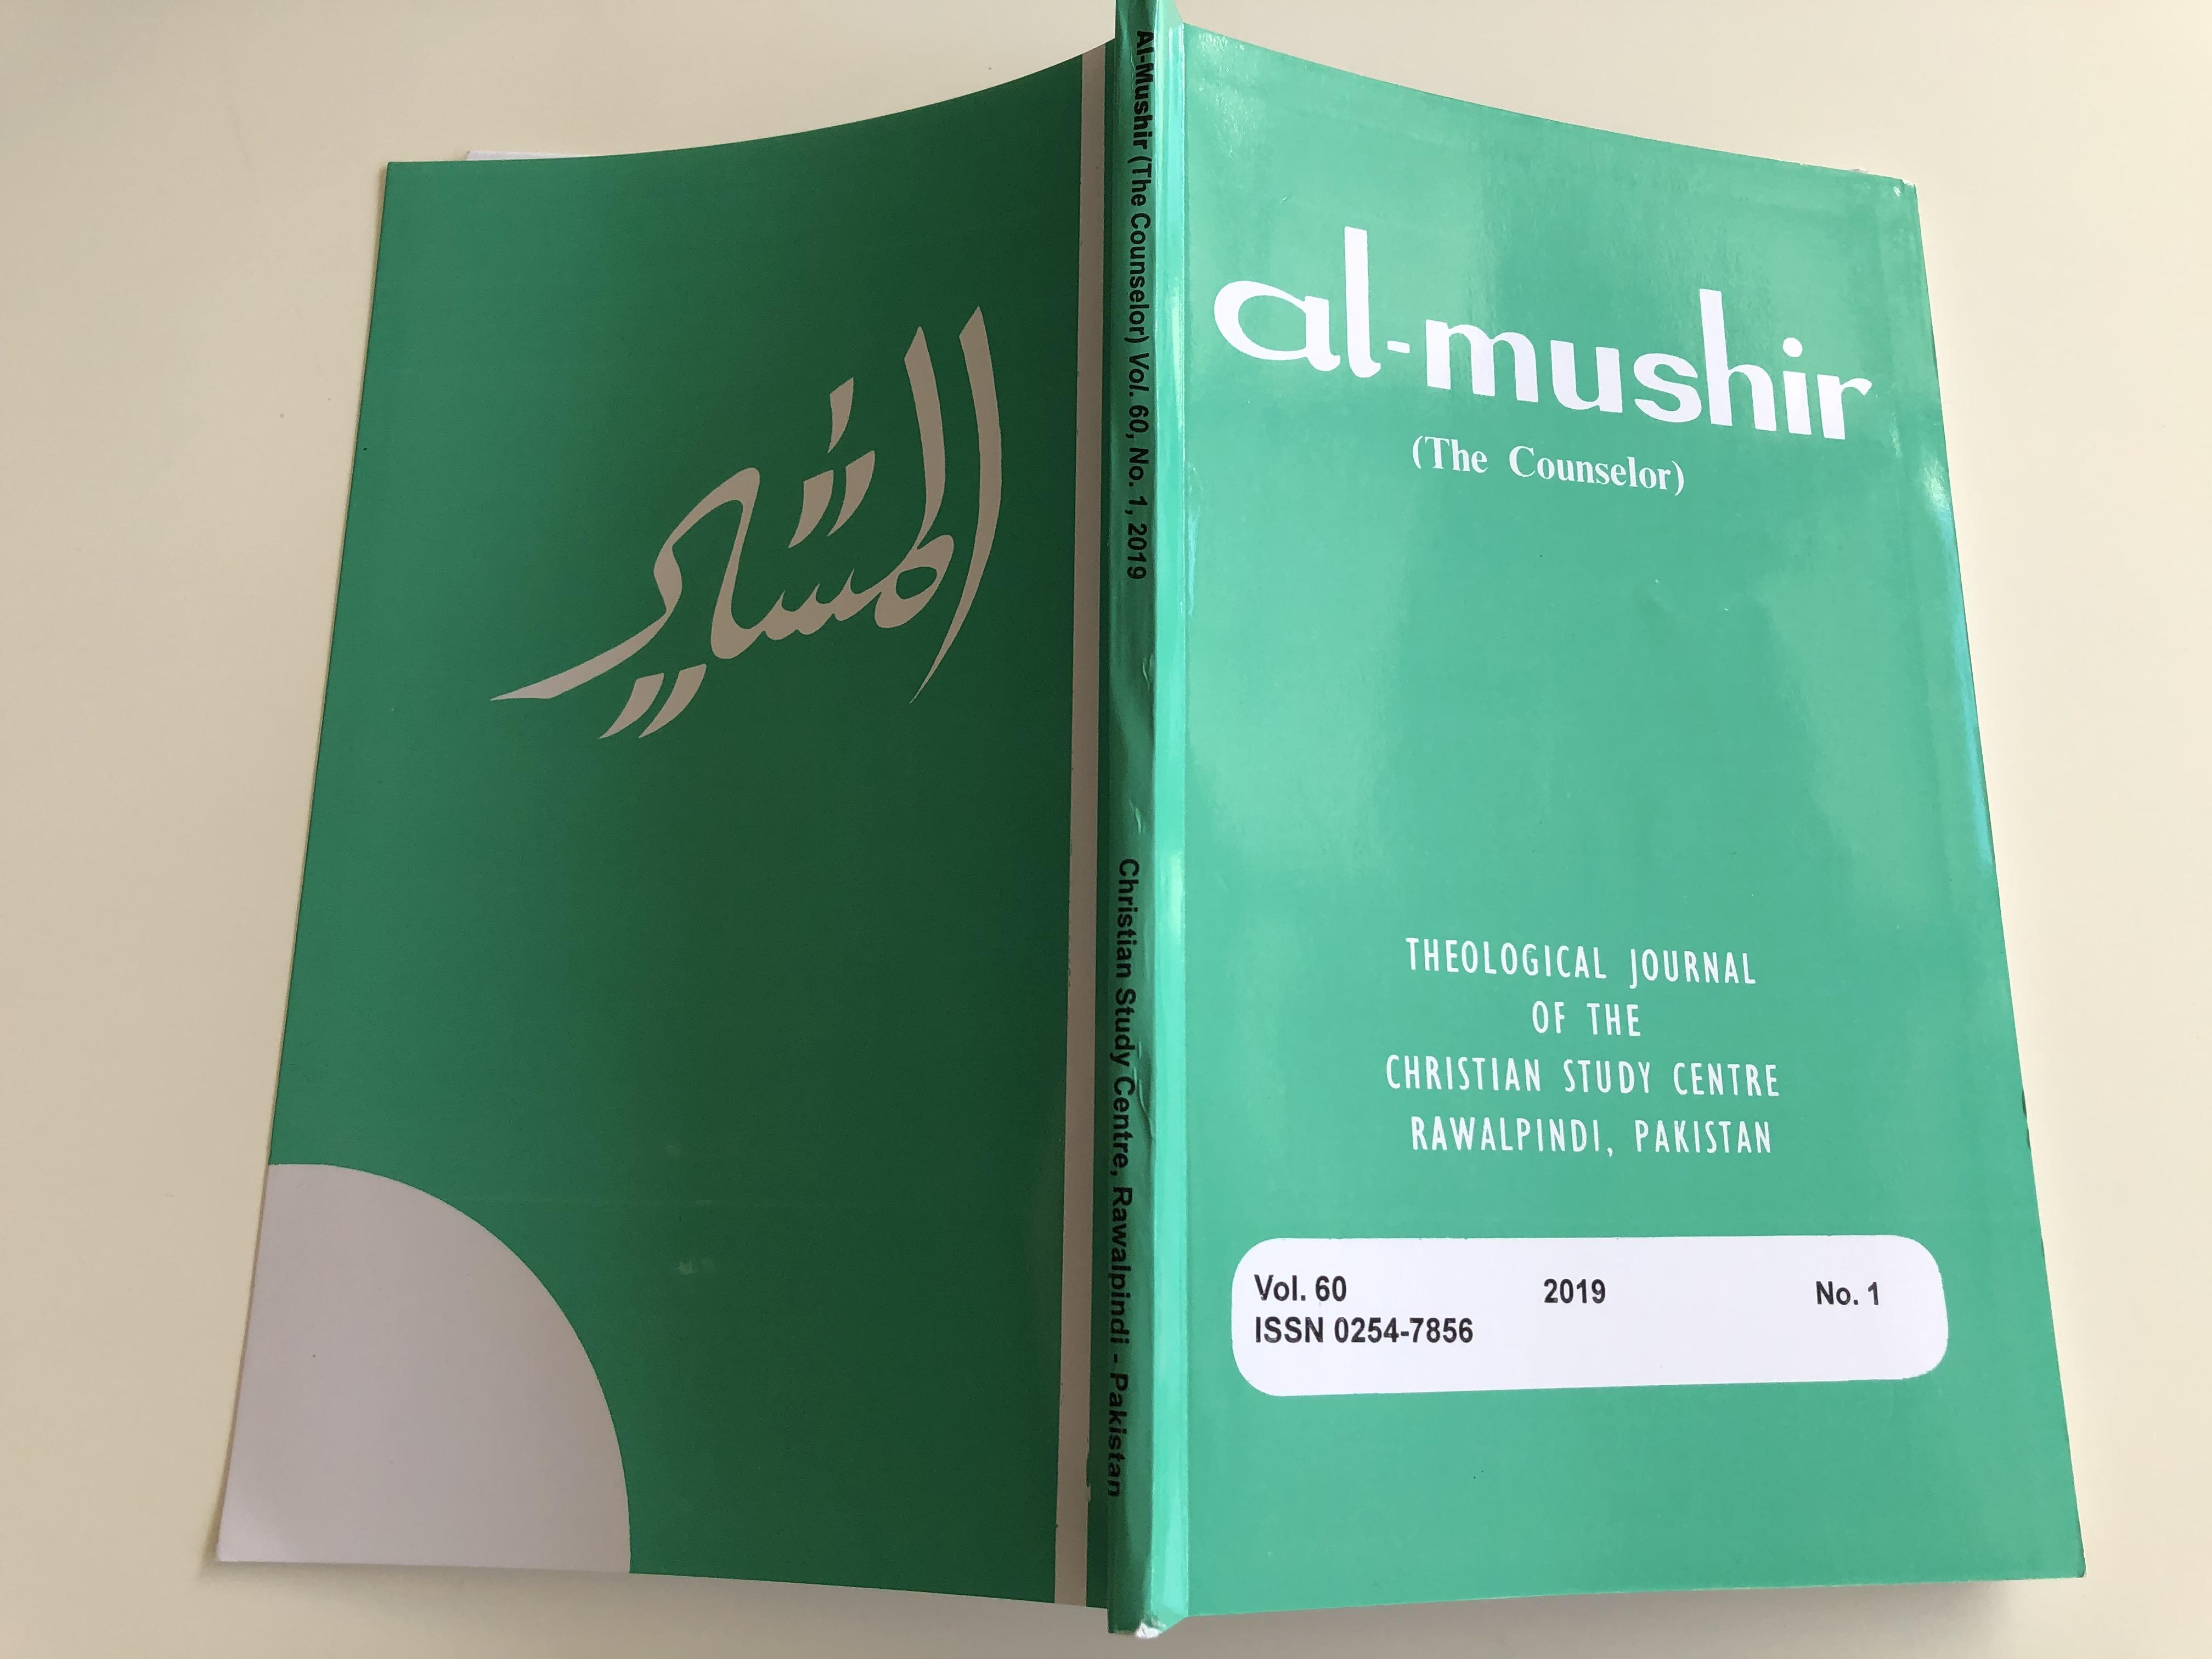 al-mushir-the-counselor-volume-60.-no.-1-10.jpg